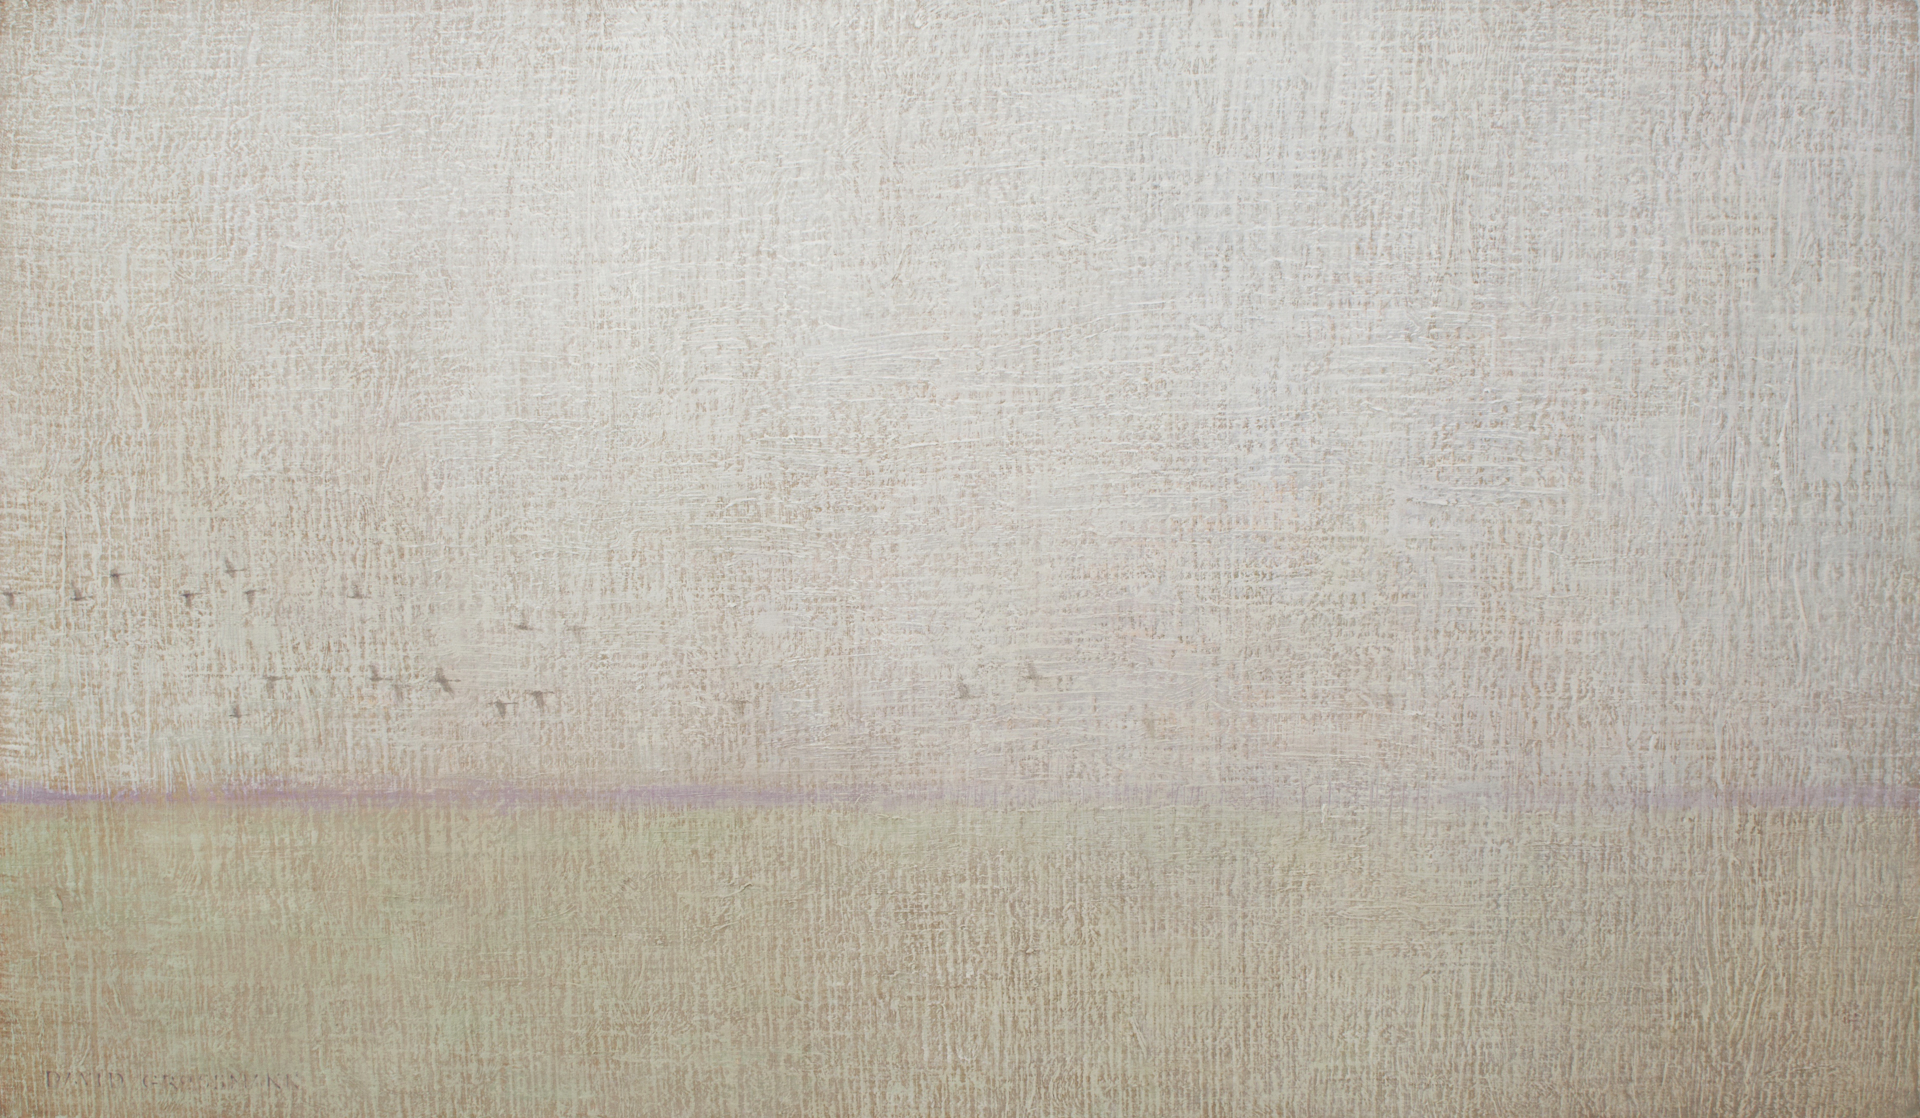 Flight into Rain by David Grossmann